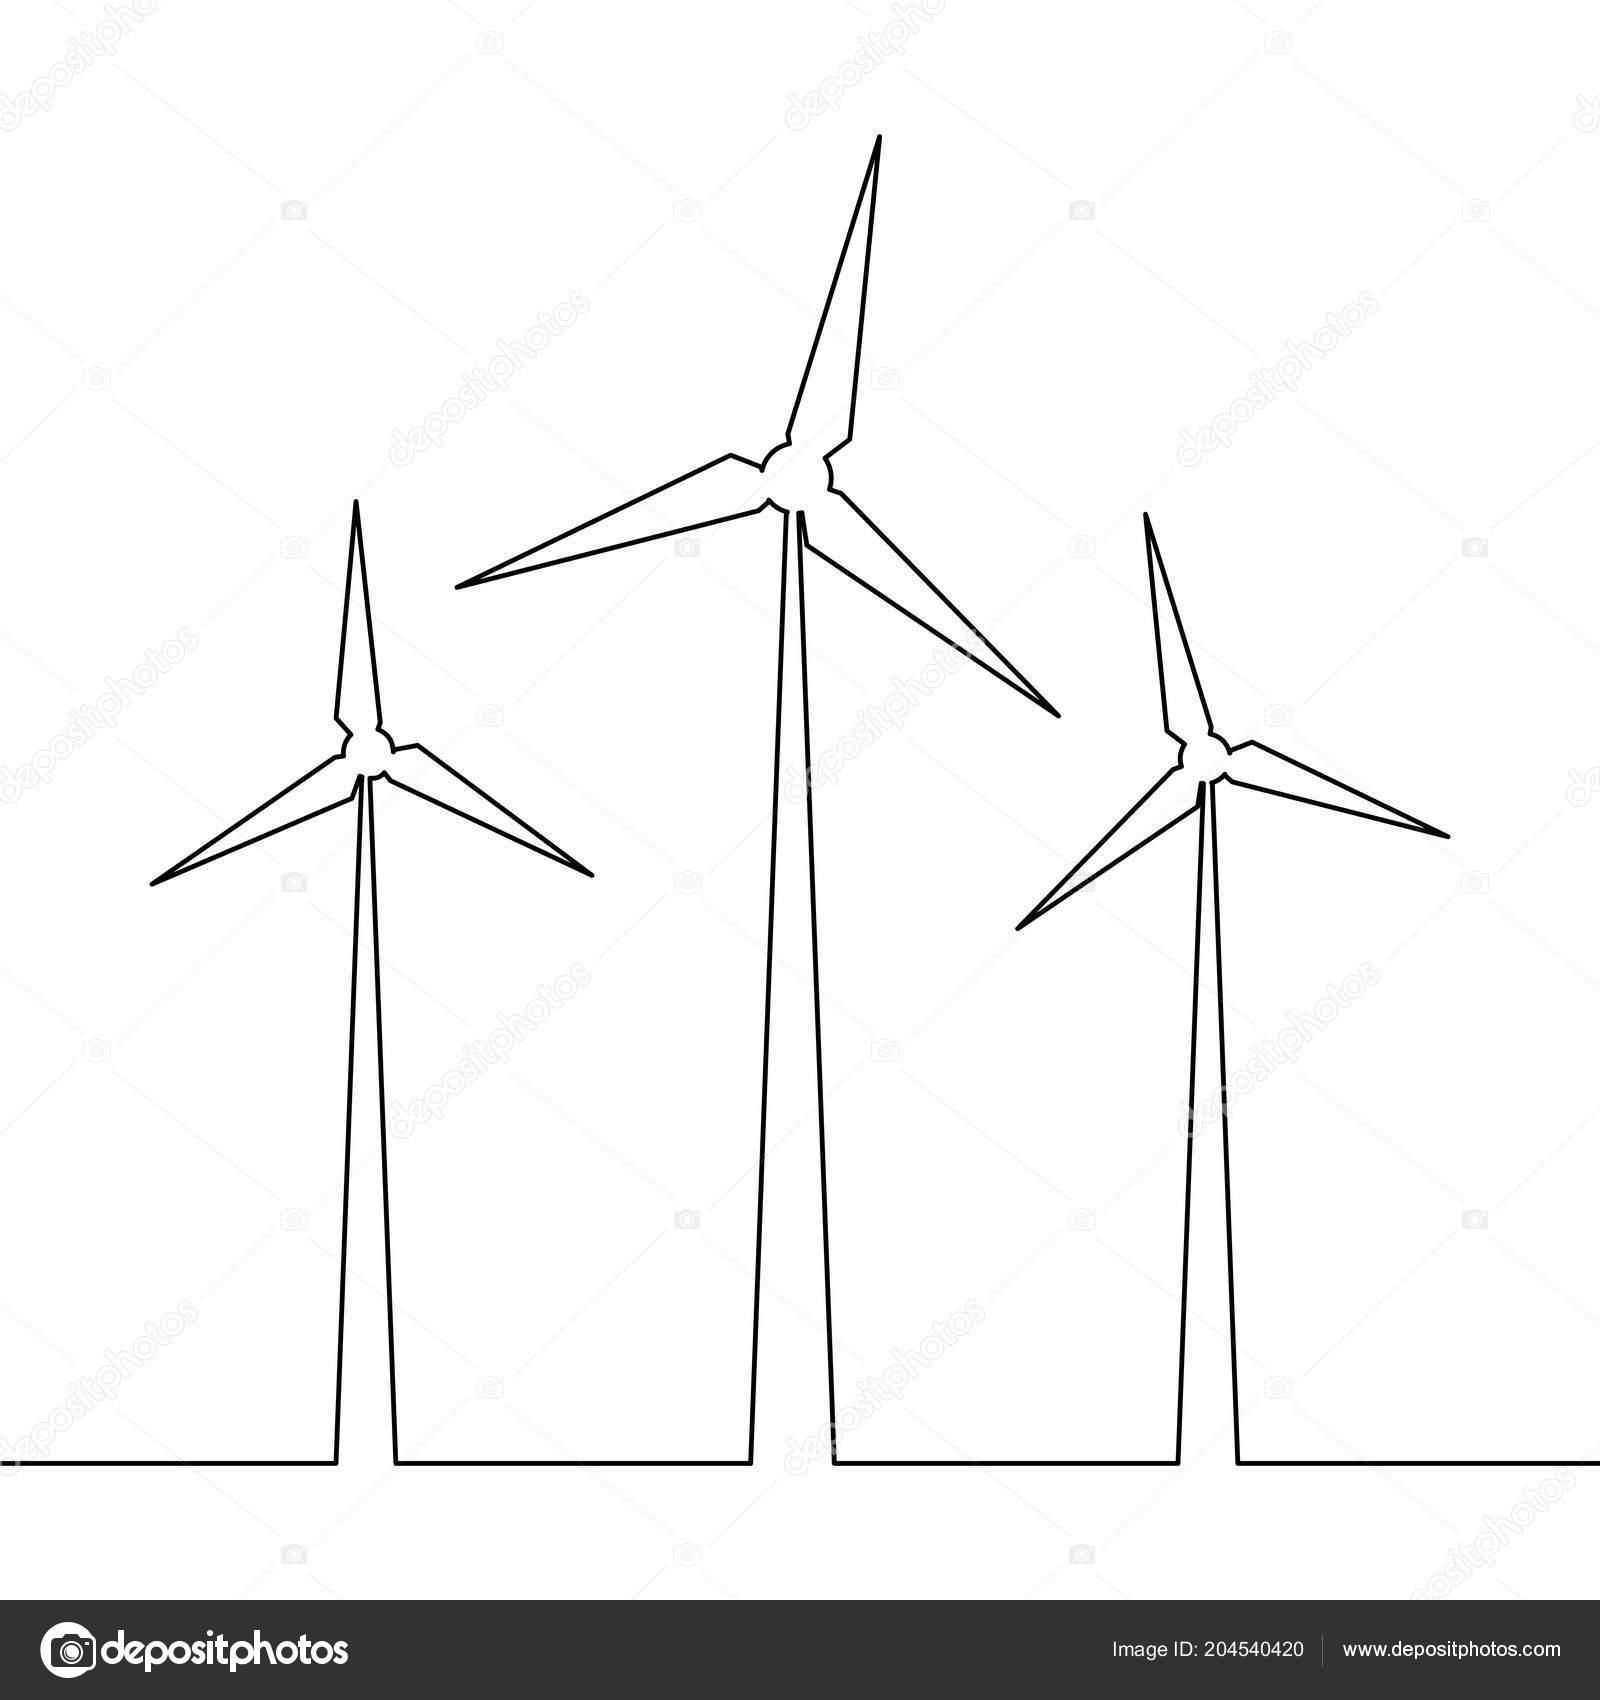 Continuous One Line Drawn Wind Turbine Alternative Energy Concept Diagrams Symbol Stock Vector